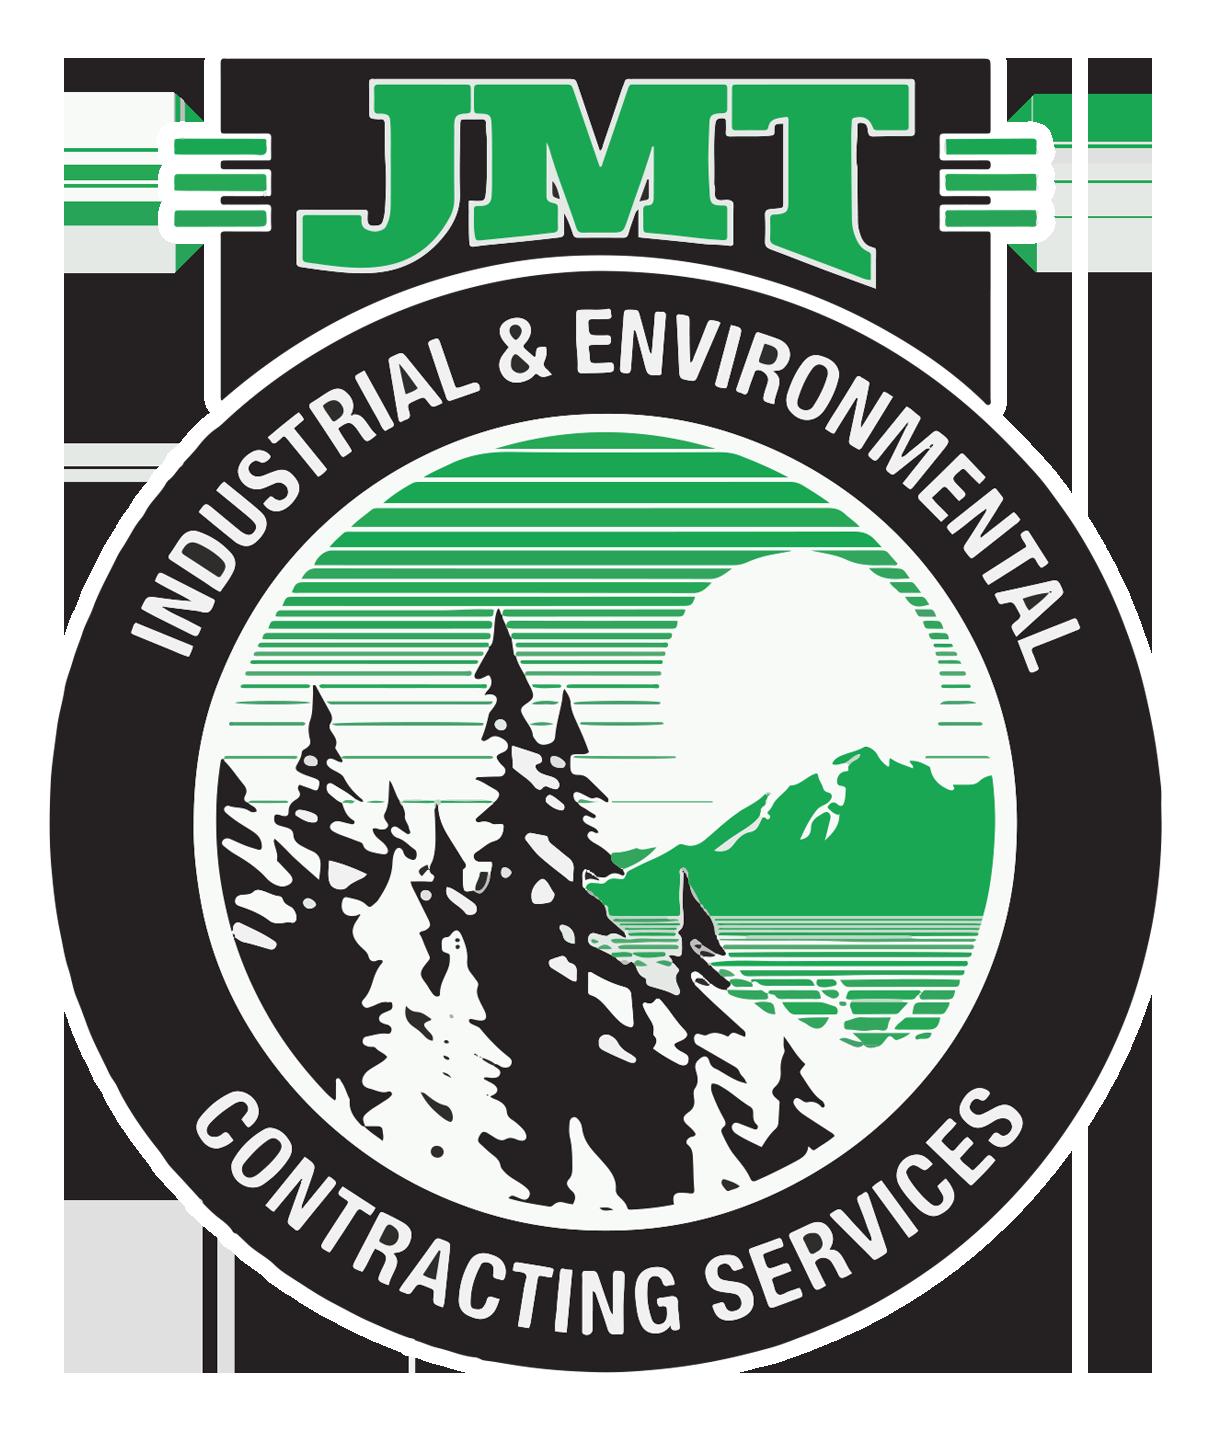 JMT Environmental